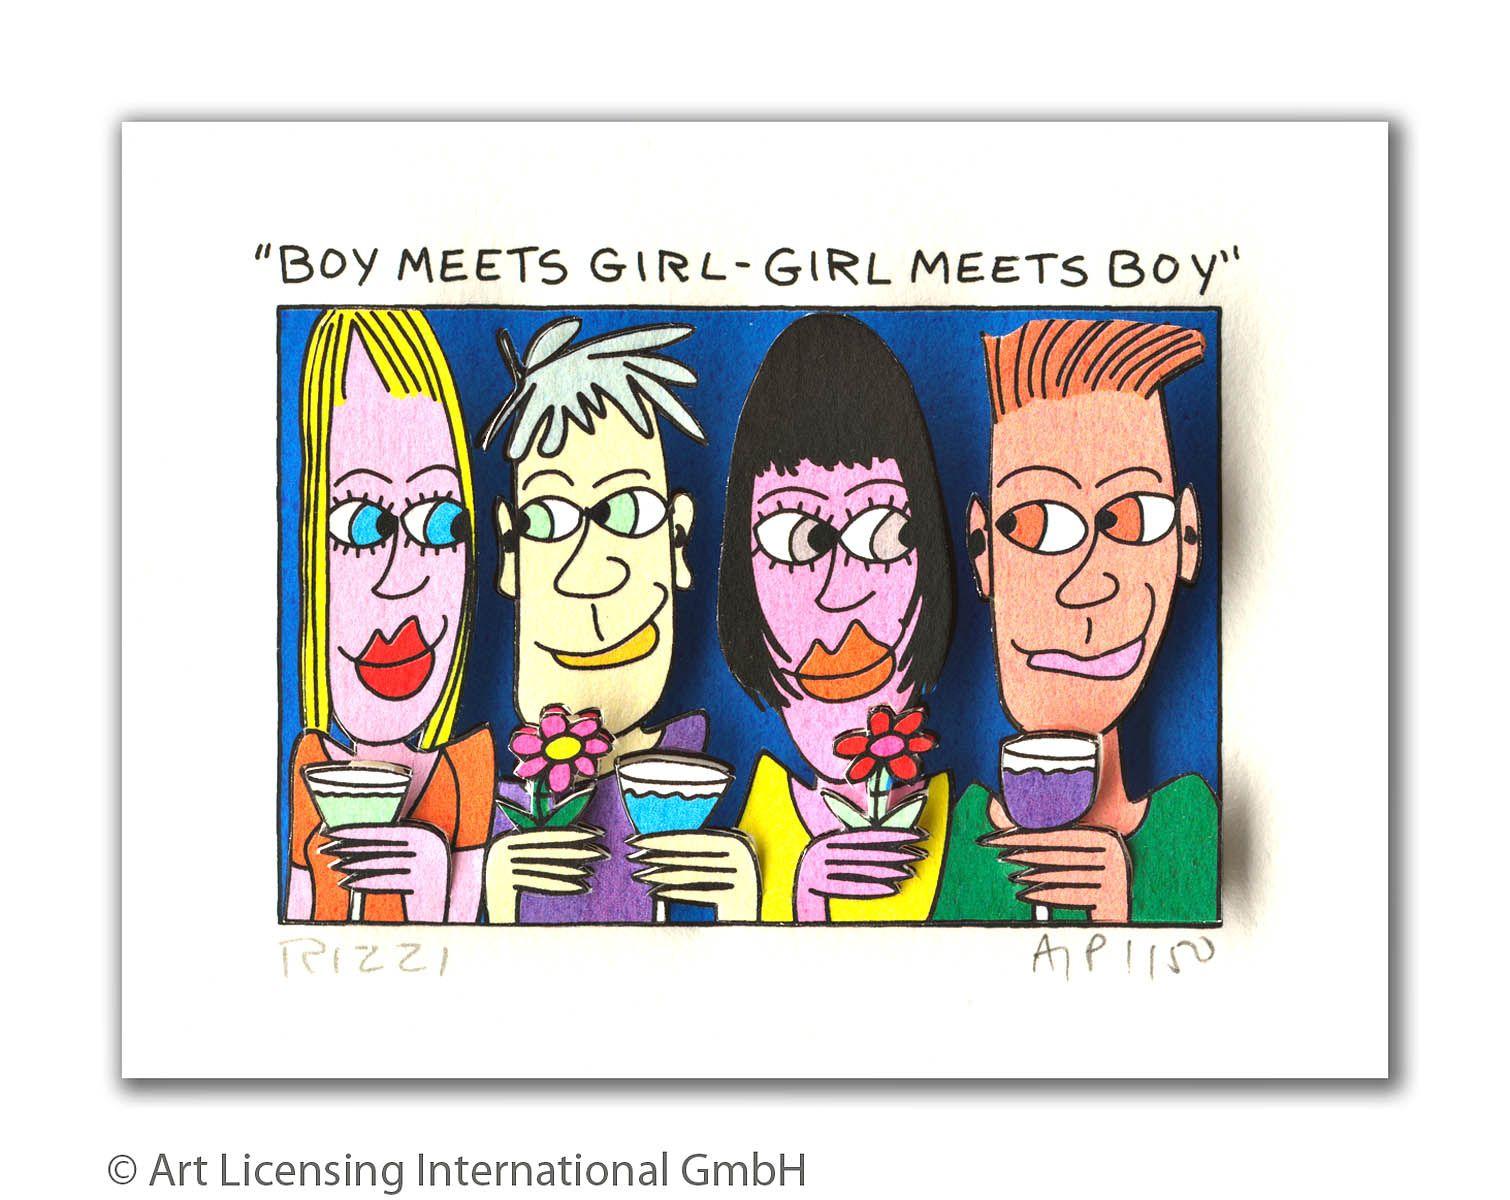 James Rizzi -  BOY MEETS GIRL - GIRL MEETS BOY